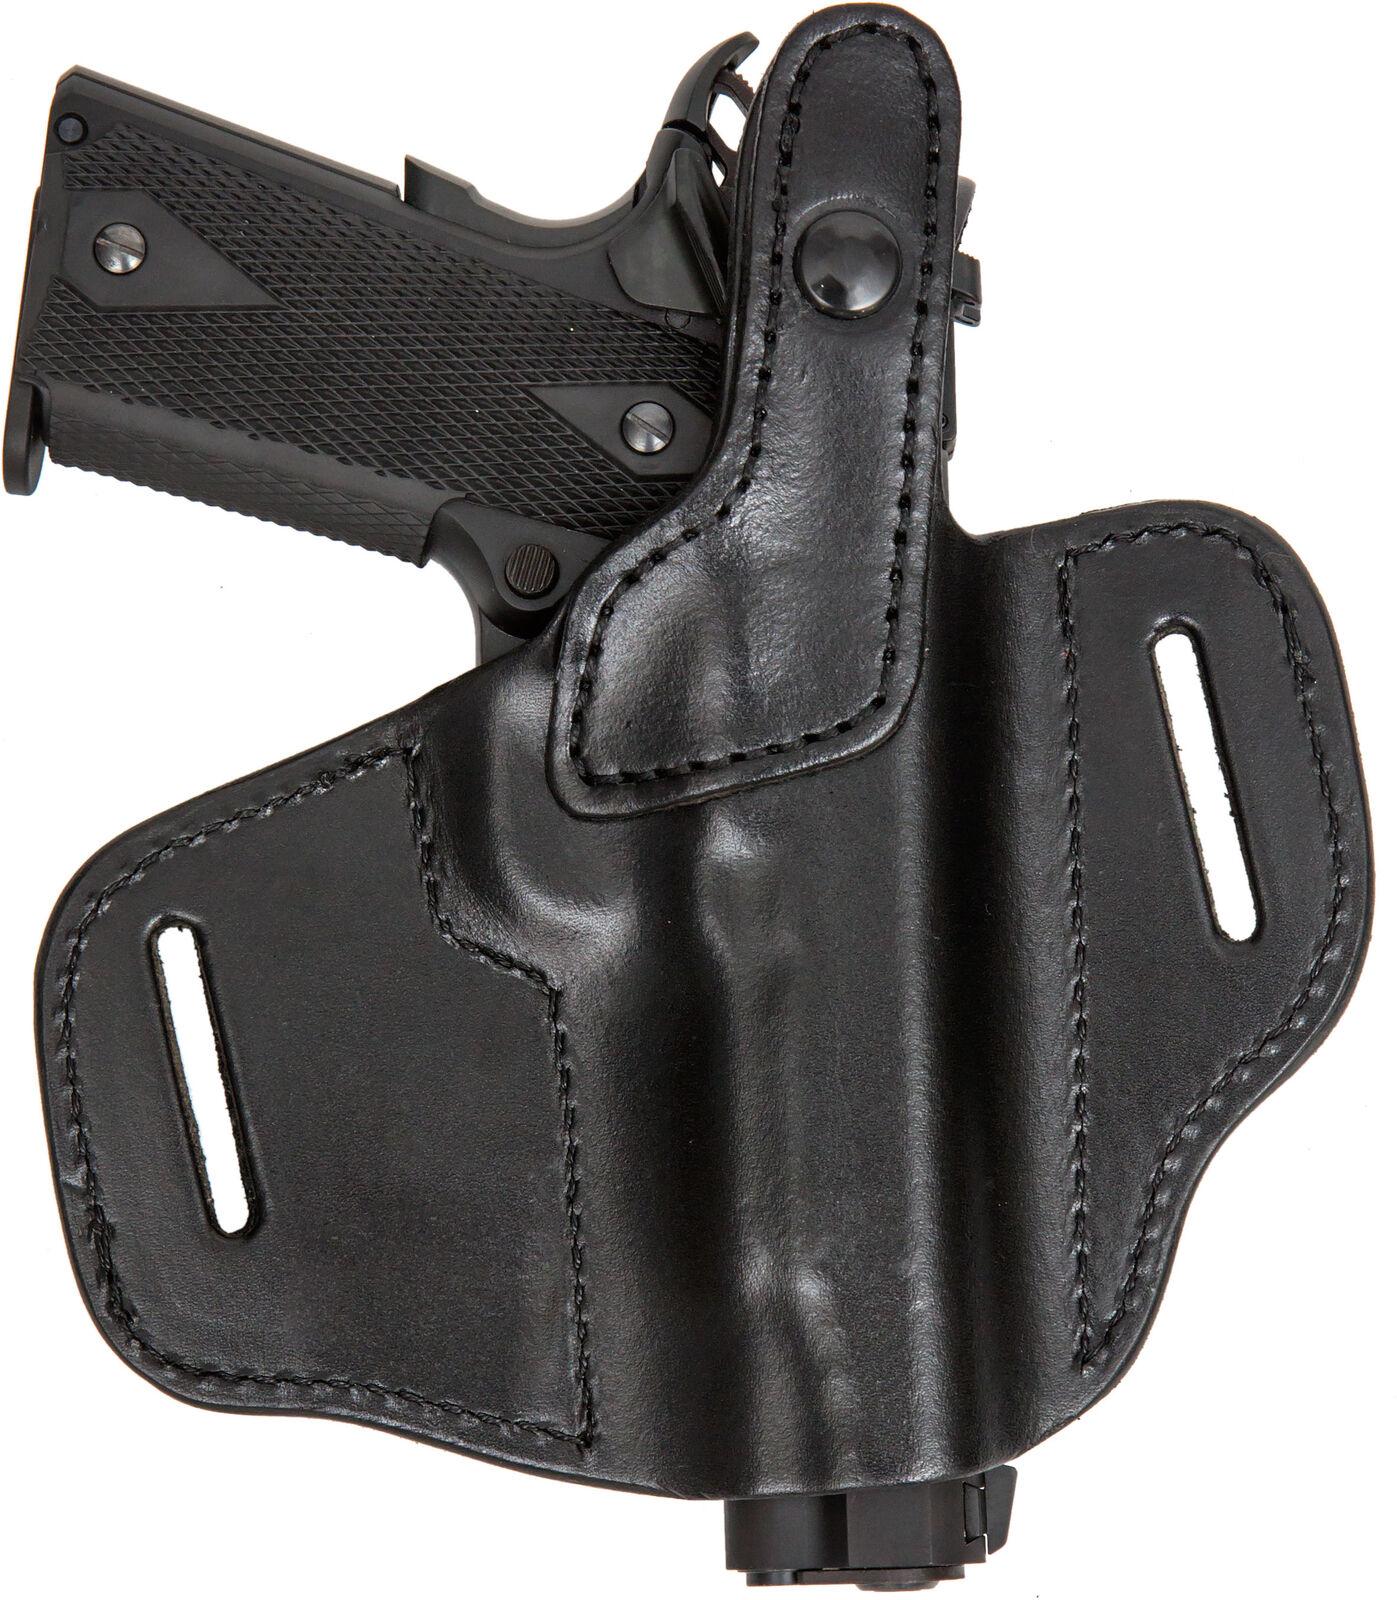 On LH Duty Conceal RH LH On OWB Leder Gun Holster For S&W Shield M 2.0 6ab34b